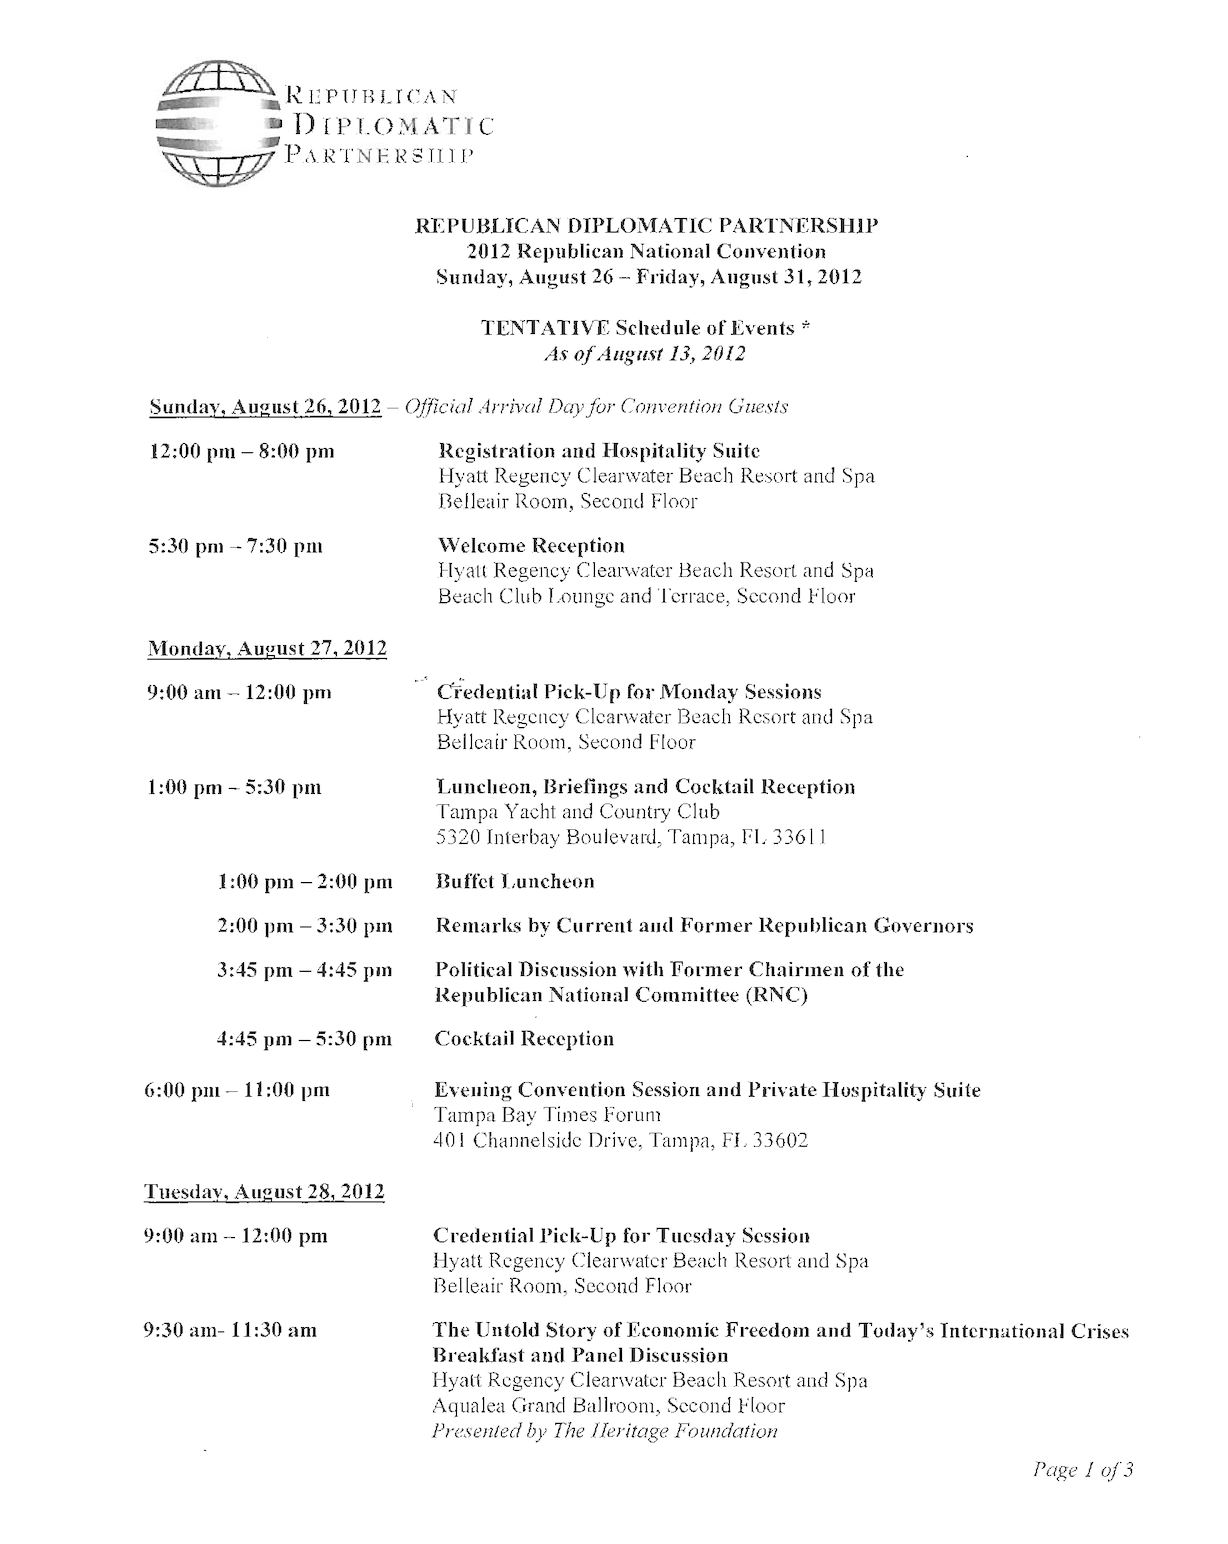 Republican National Convention Tentative Schedule